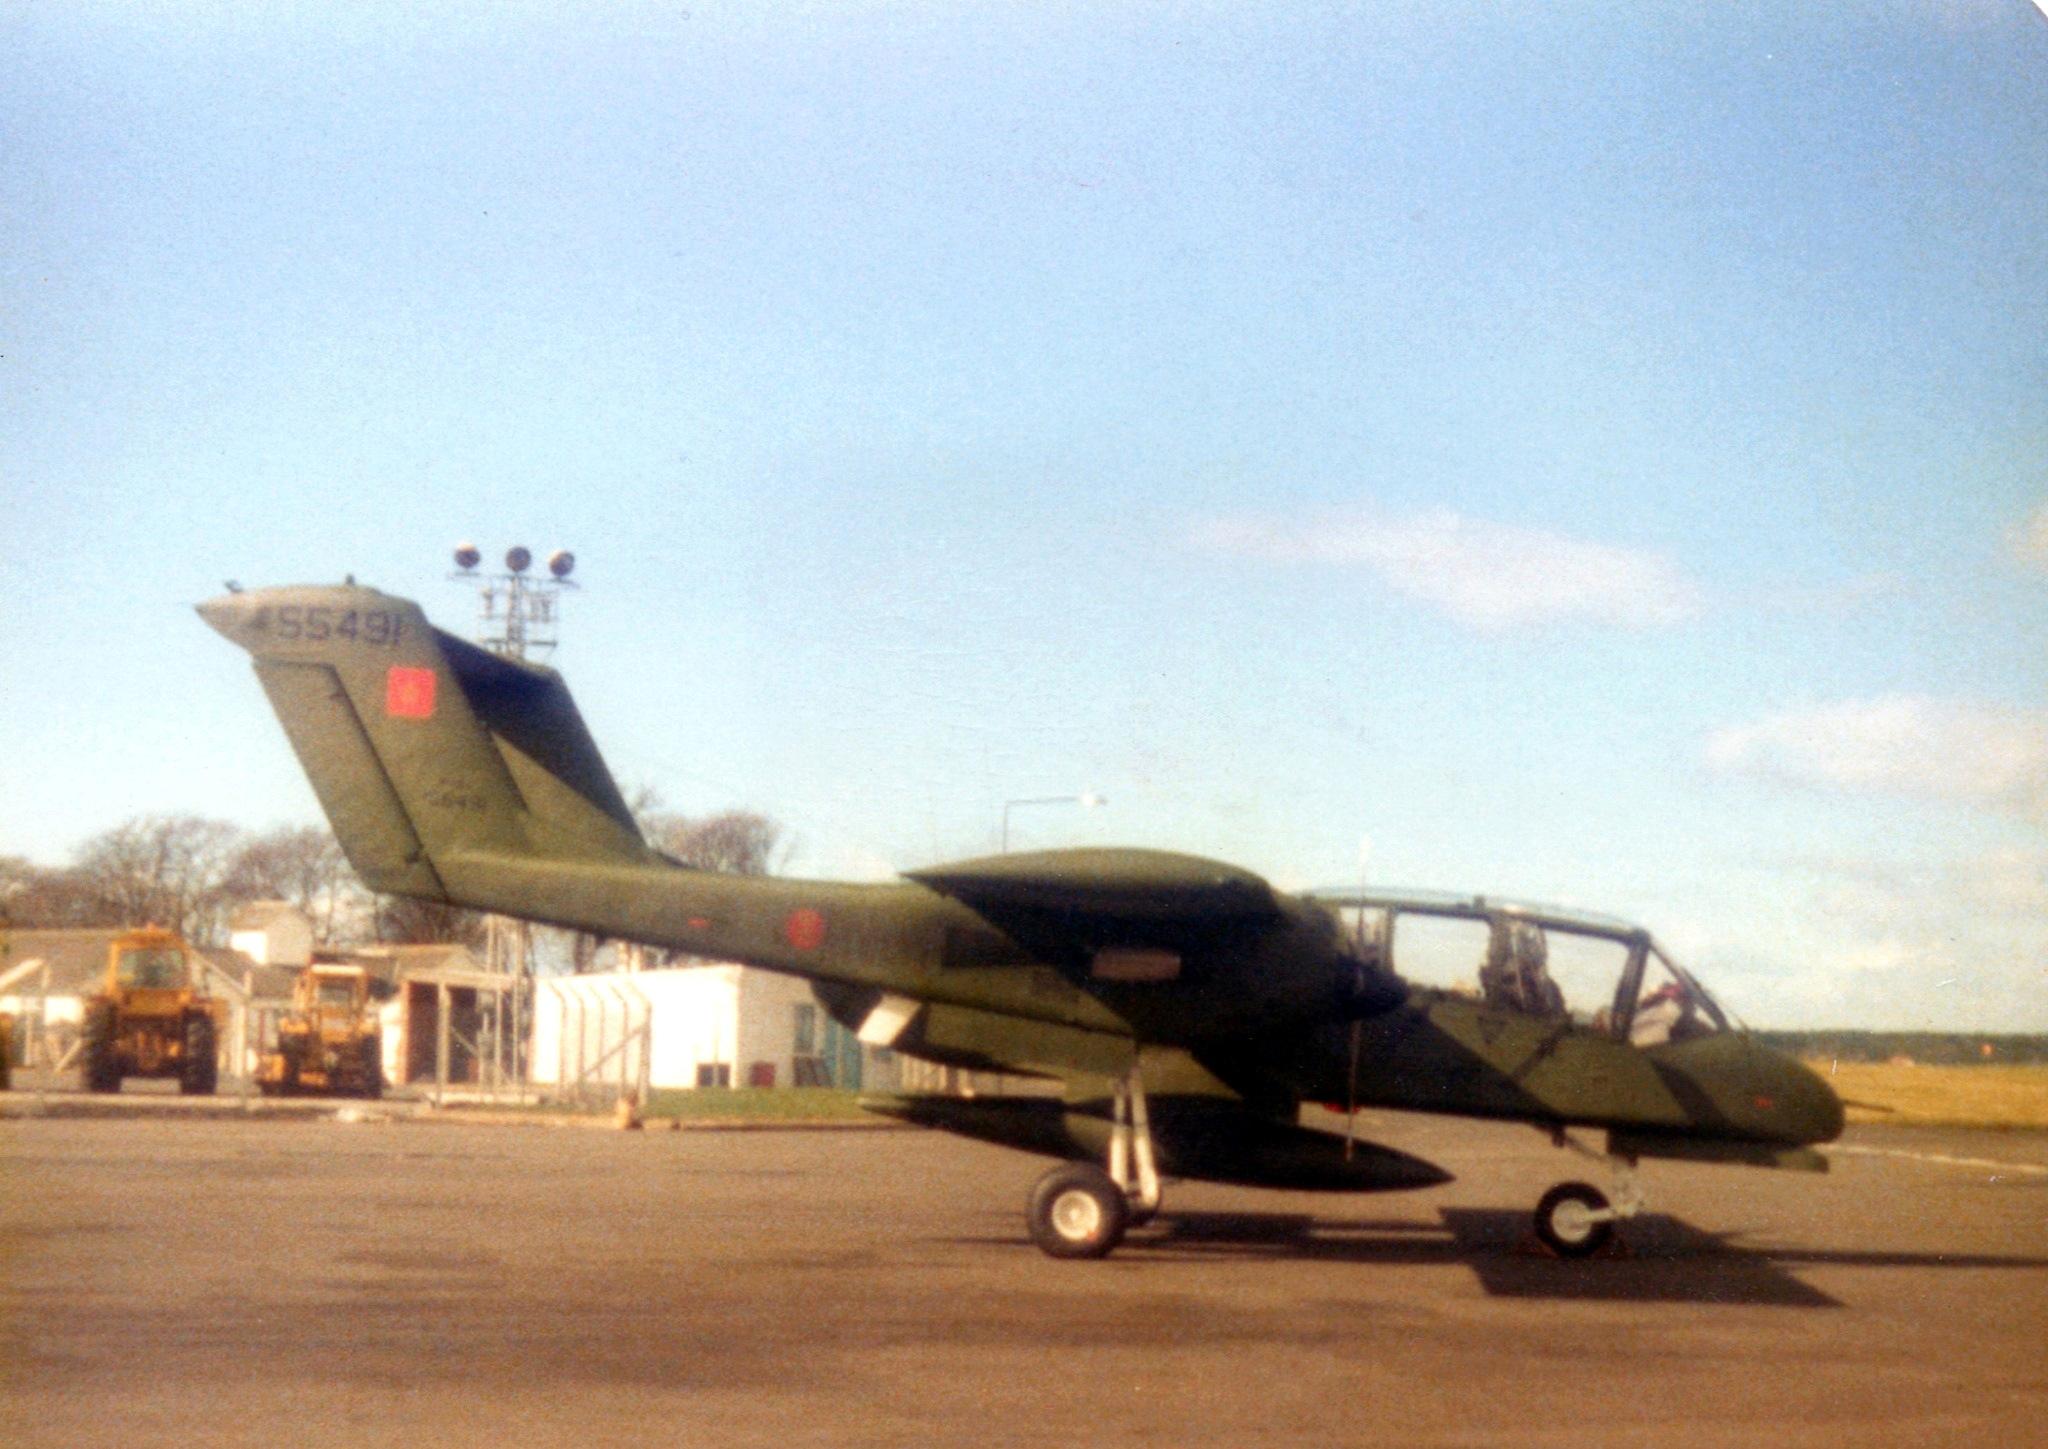 FRA: Photos anciens avions des FRA - Page 14 Clip1093